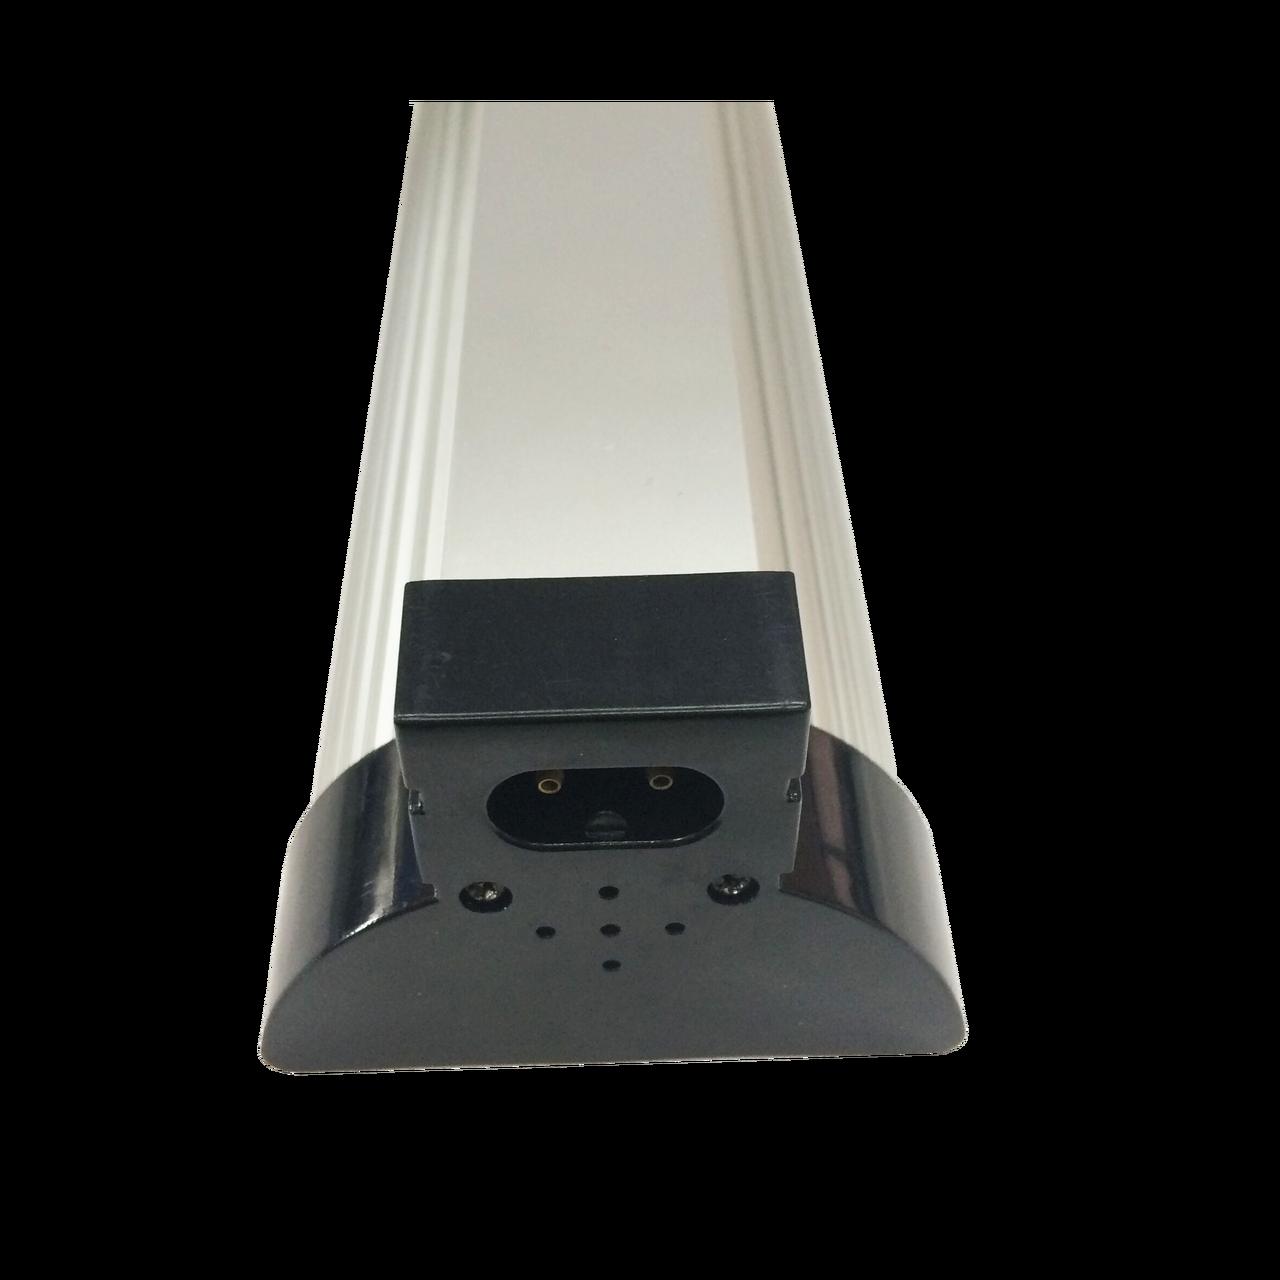 FloraGear Flora LS48 LED Light Strip 6400k 48w - end view - can link up to 7 lights